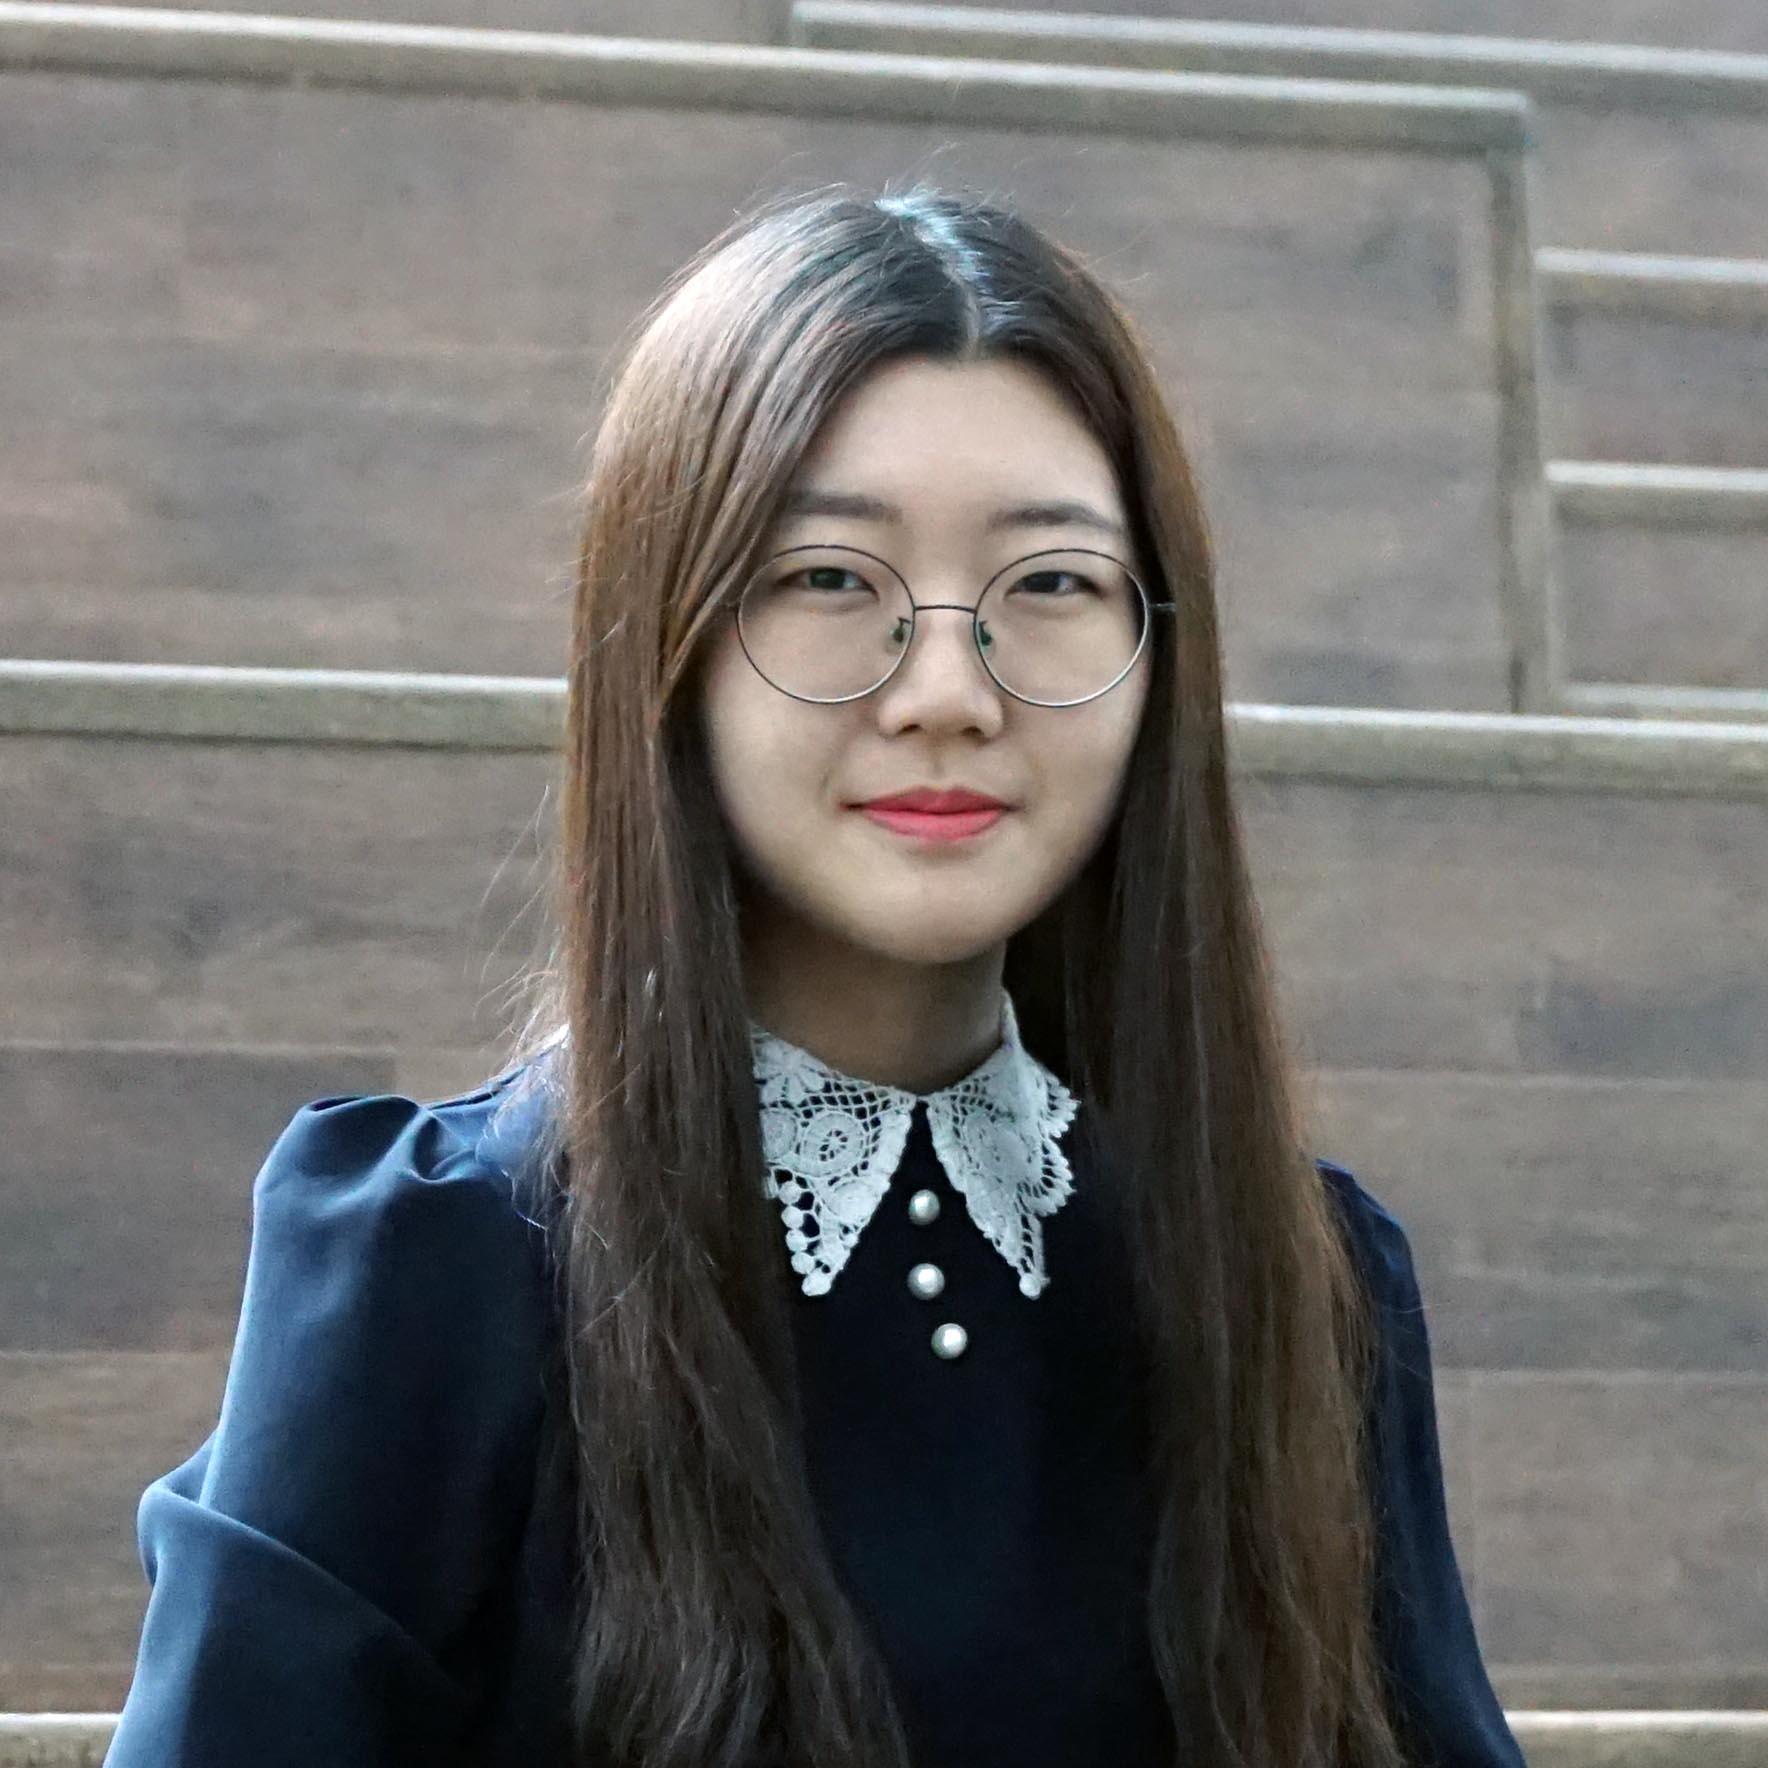 JiHyun Lee